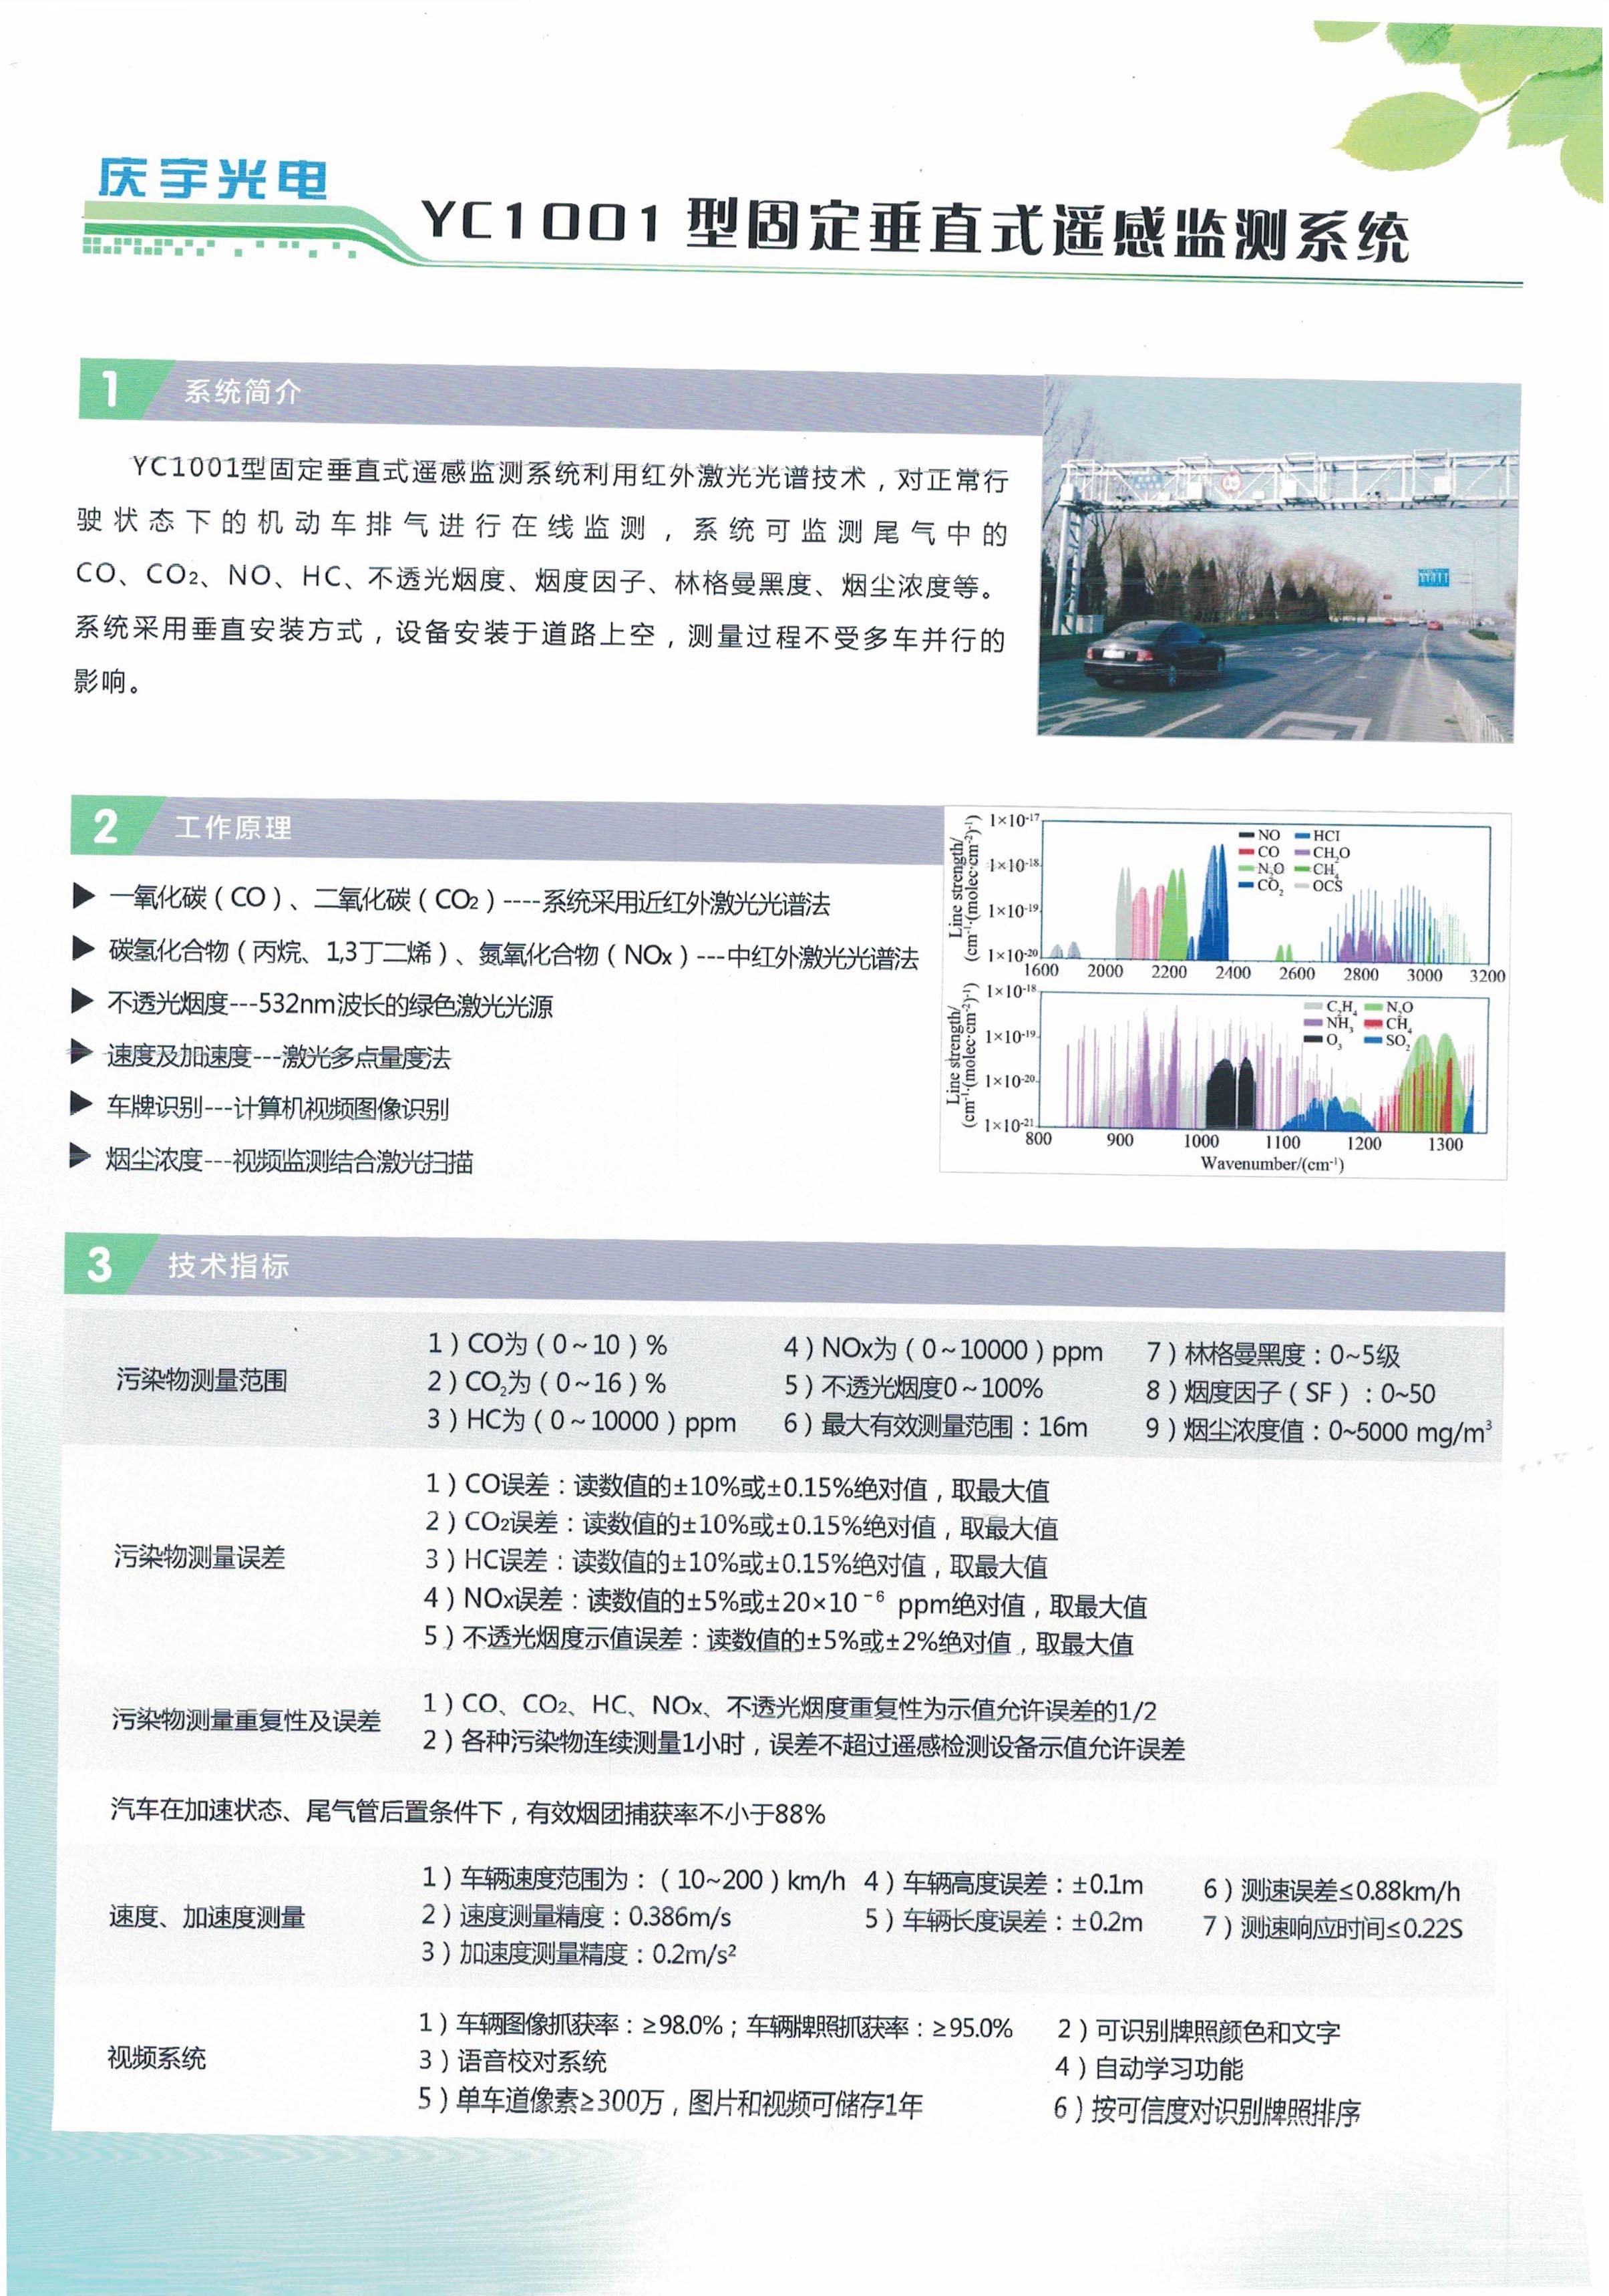 YC1001型固定垂直式遙感監測系統